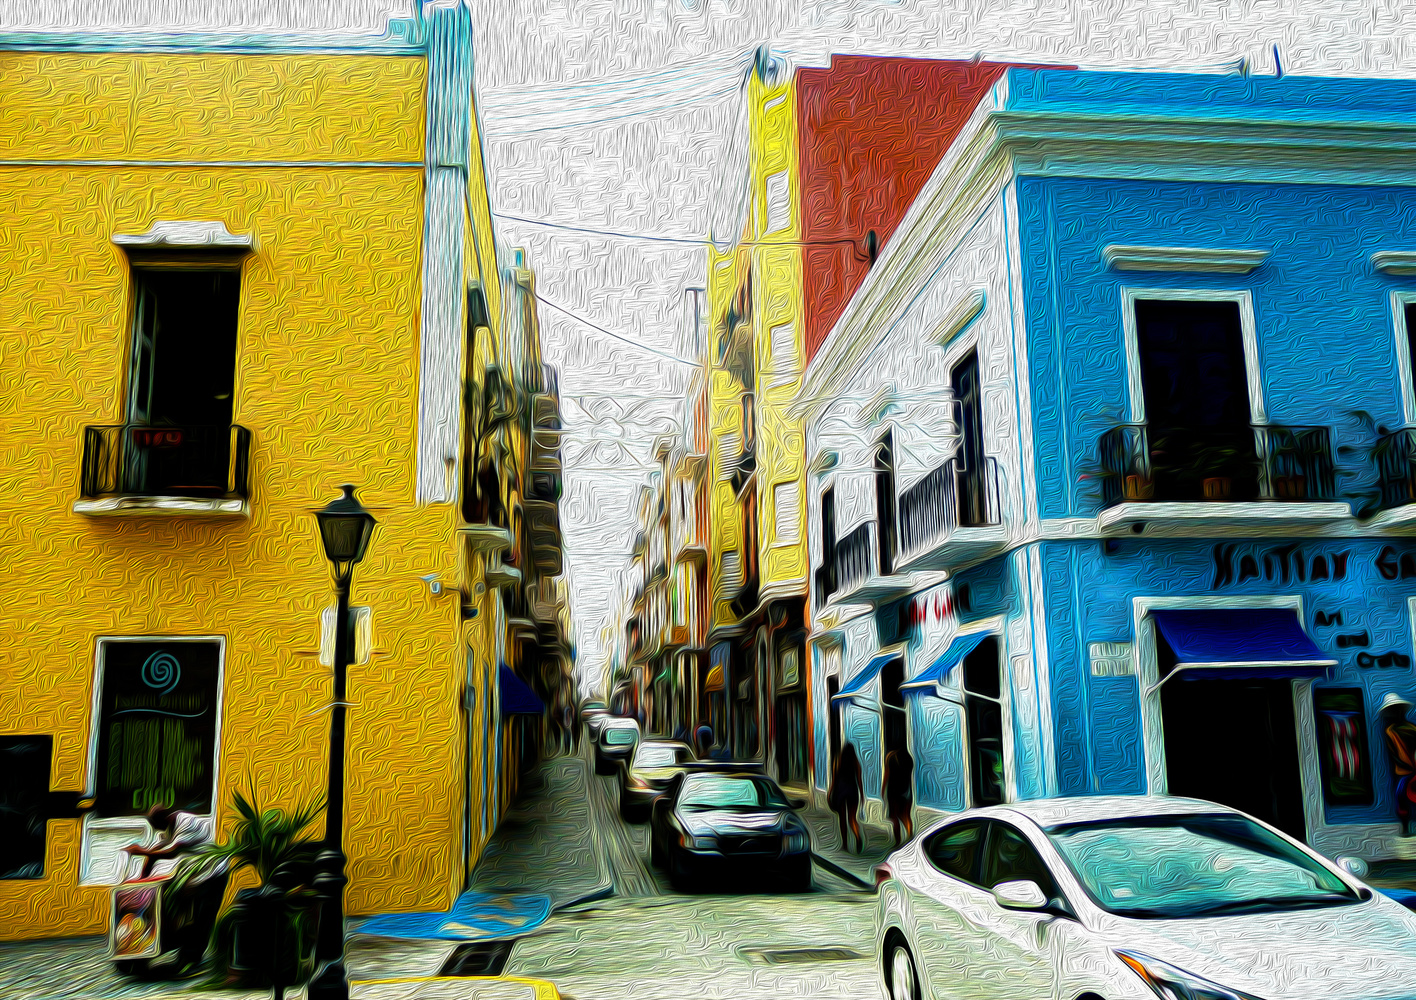 Streets of San Juan by Rohit Burra